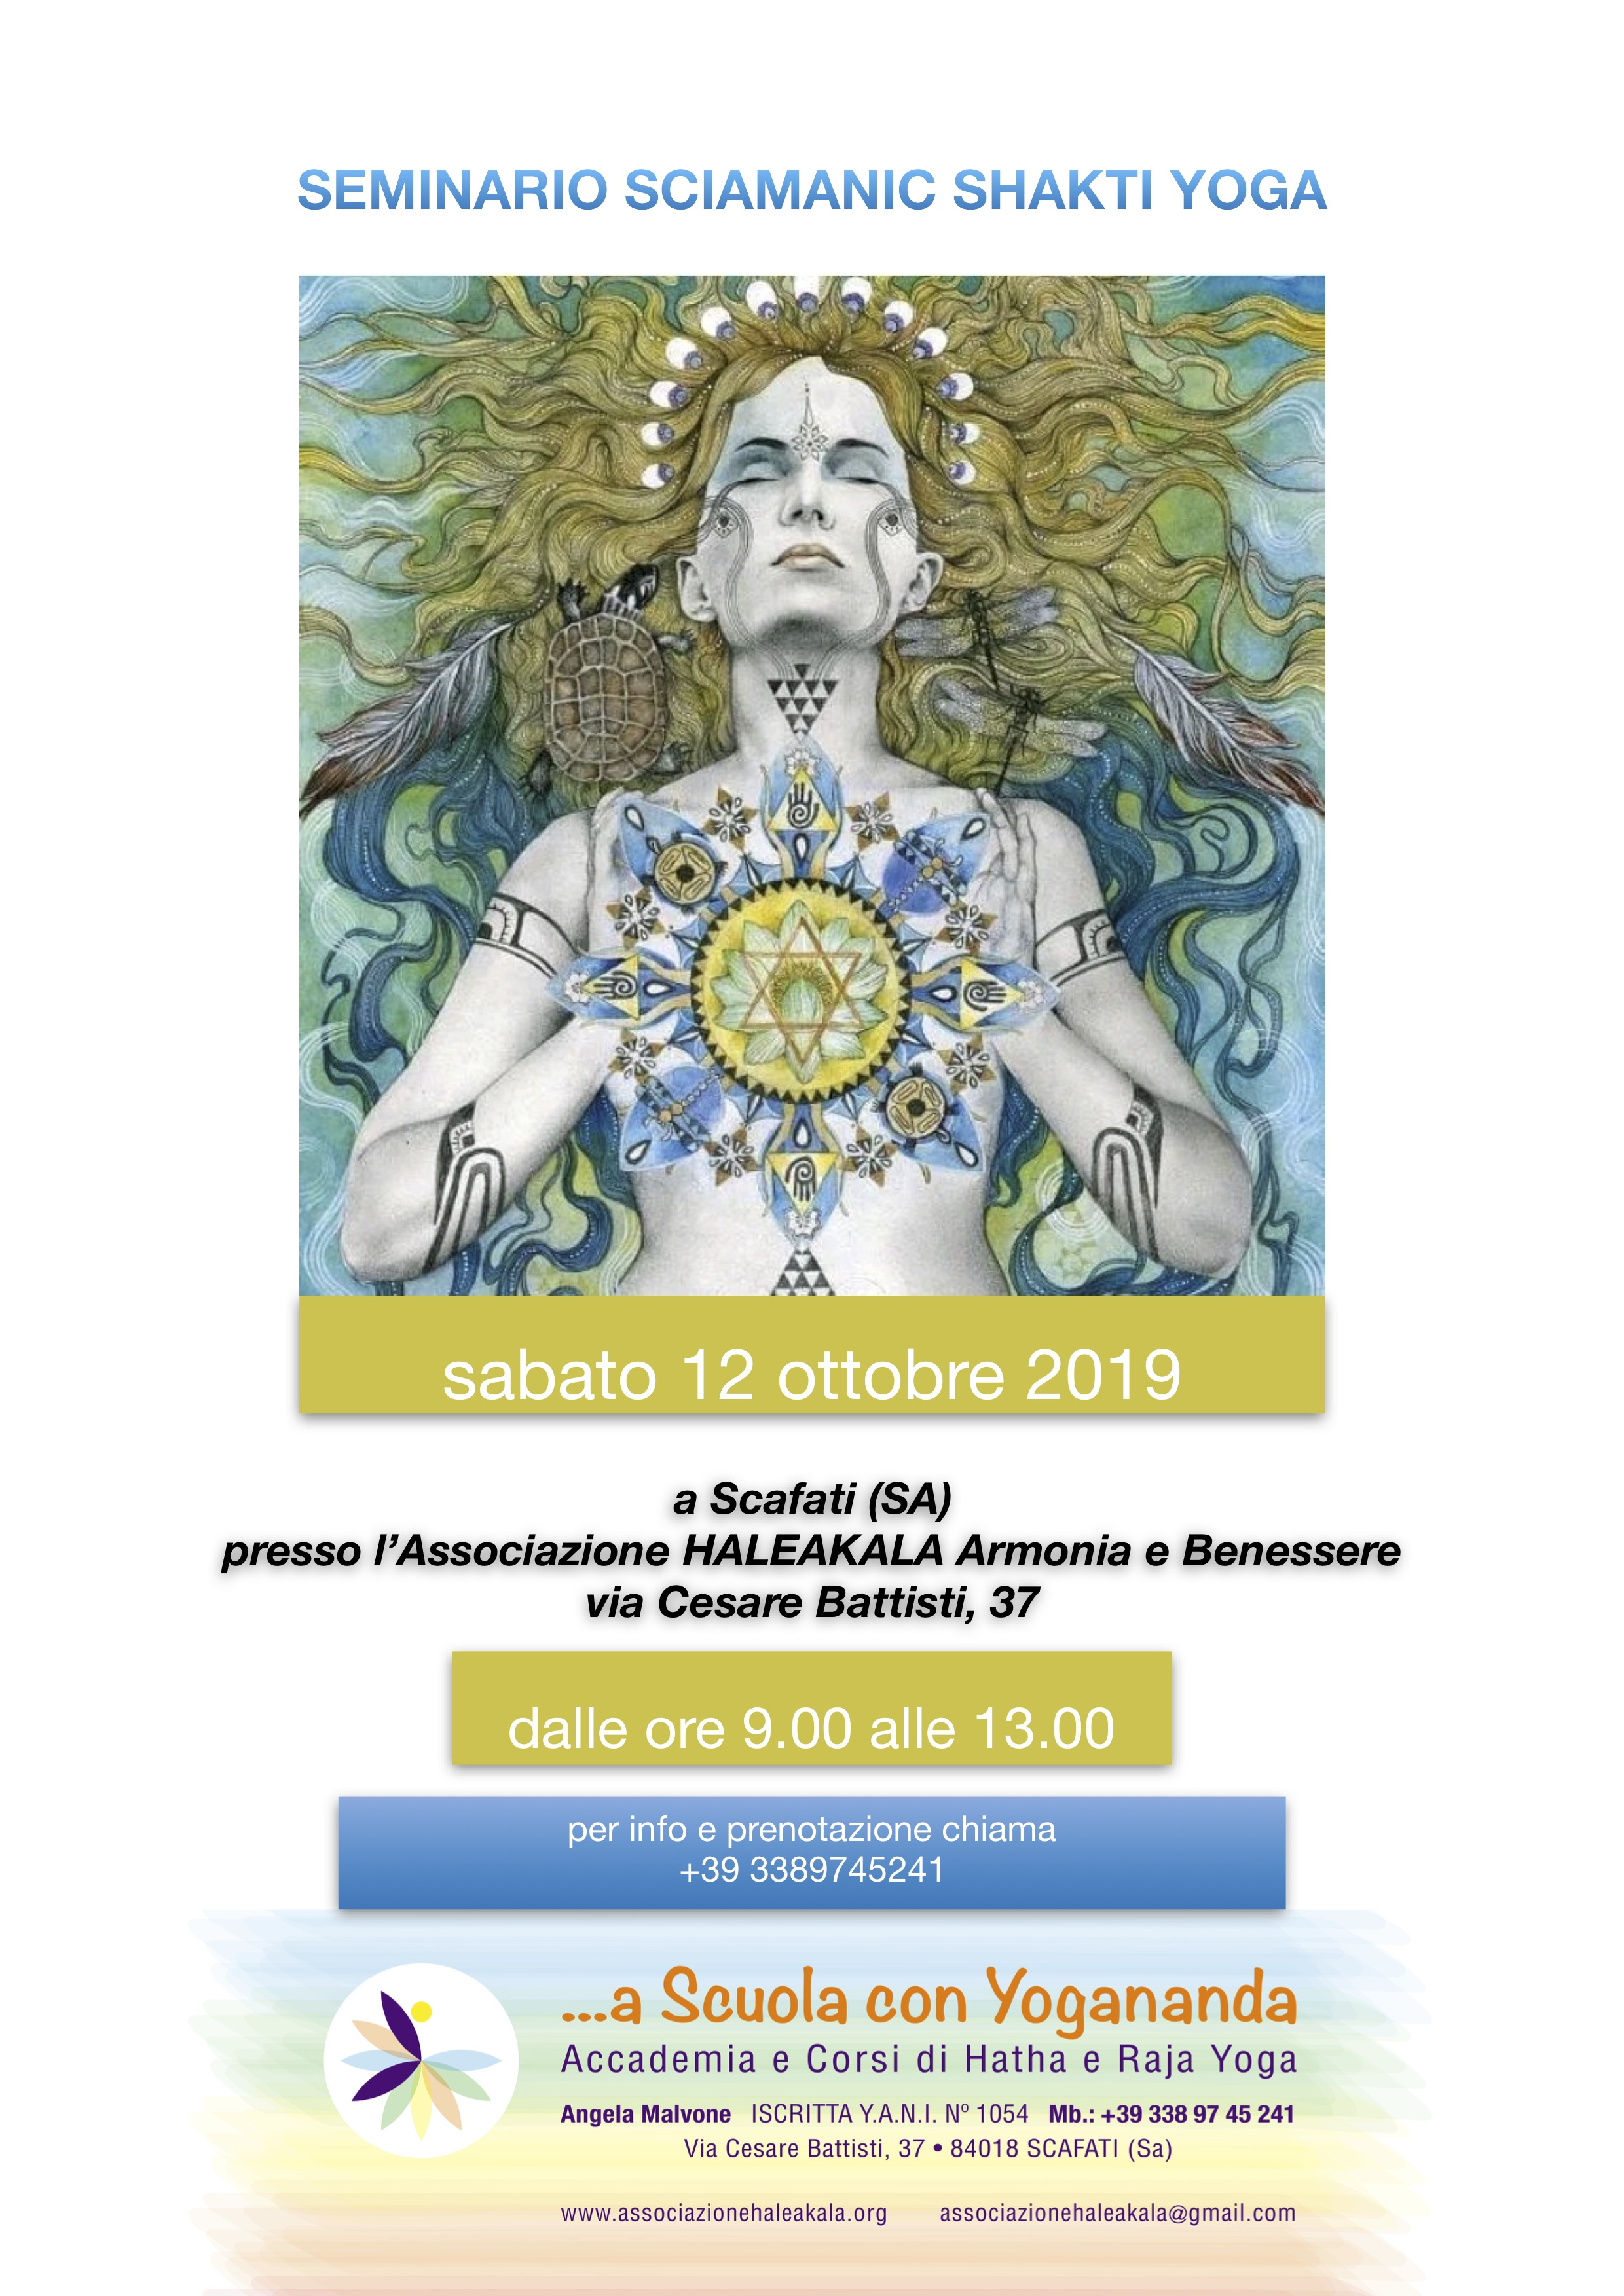 locandina sciamanic shakti yoga ott 2019